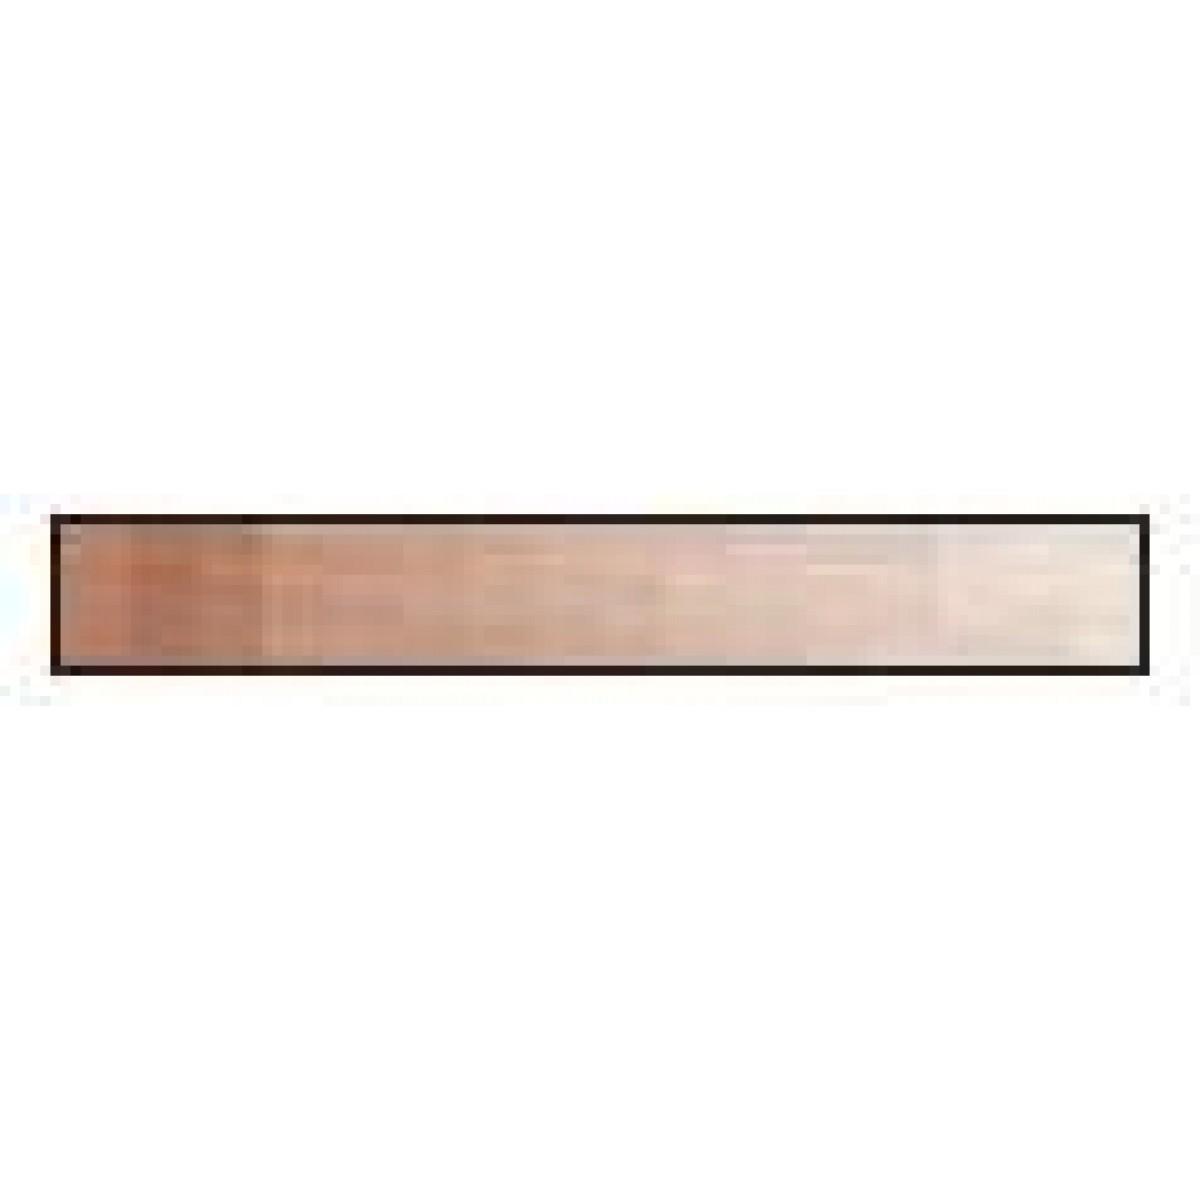 8529 Kunstnerkvalitet soft pastel Burnt sienna